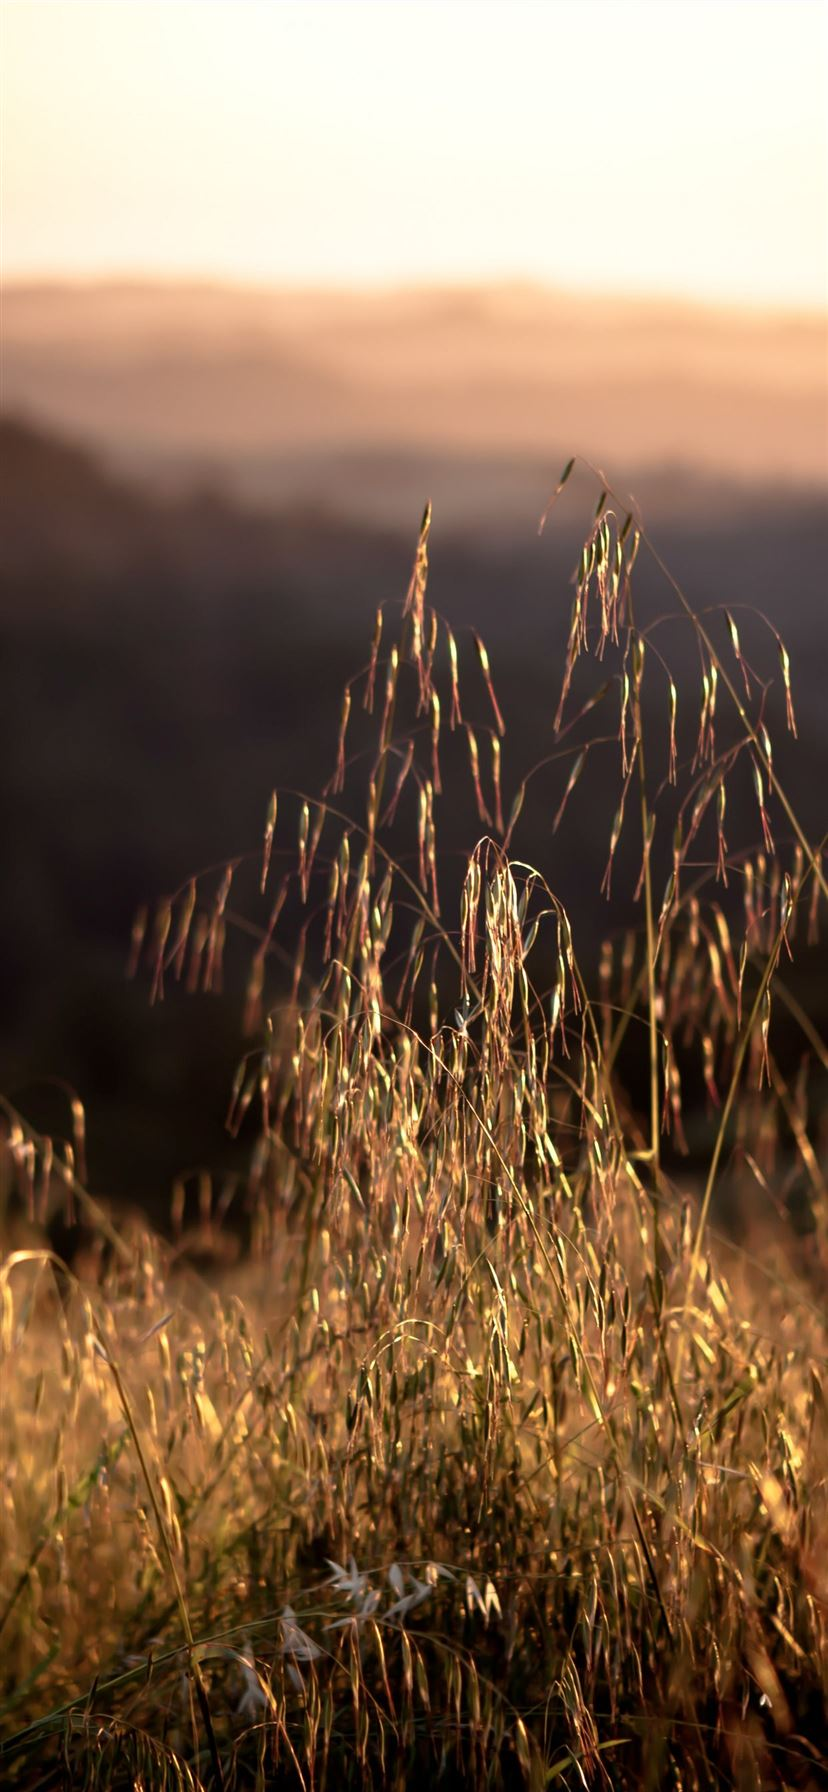 California 4k Hd 8k Field Sunset Grass Iphone 11 Wallpapers Free Download